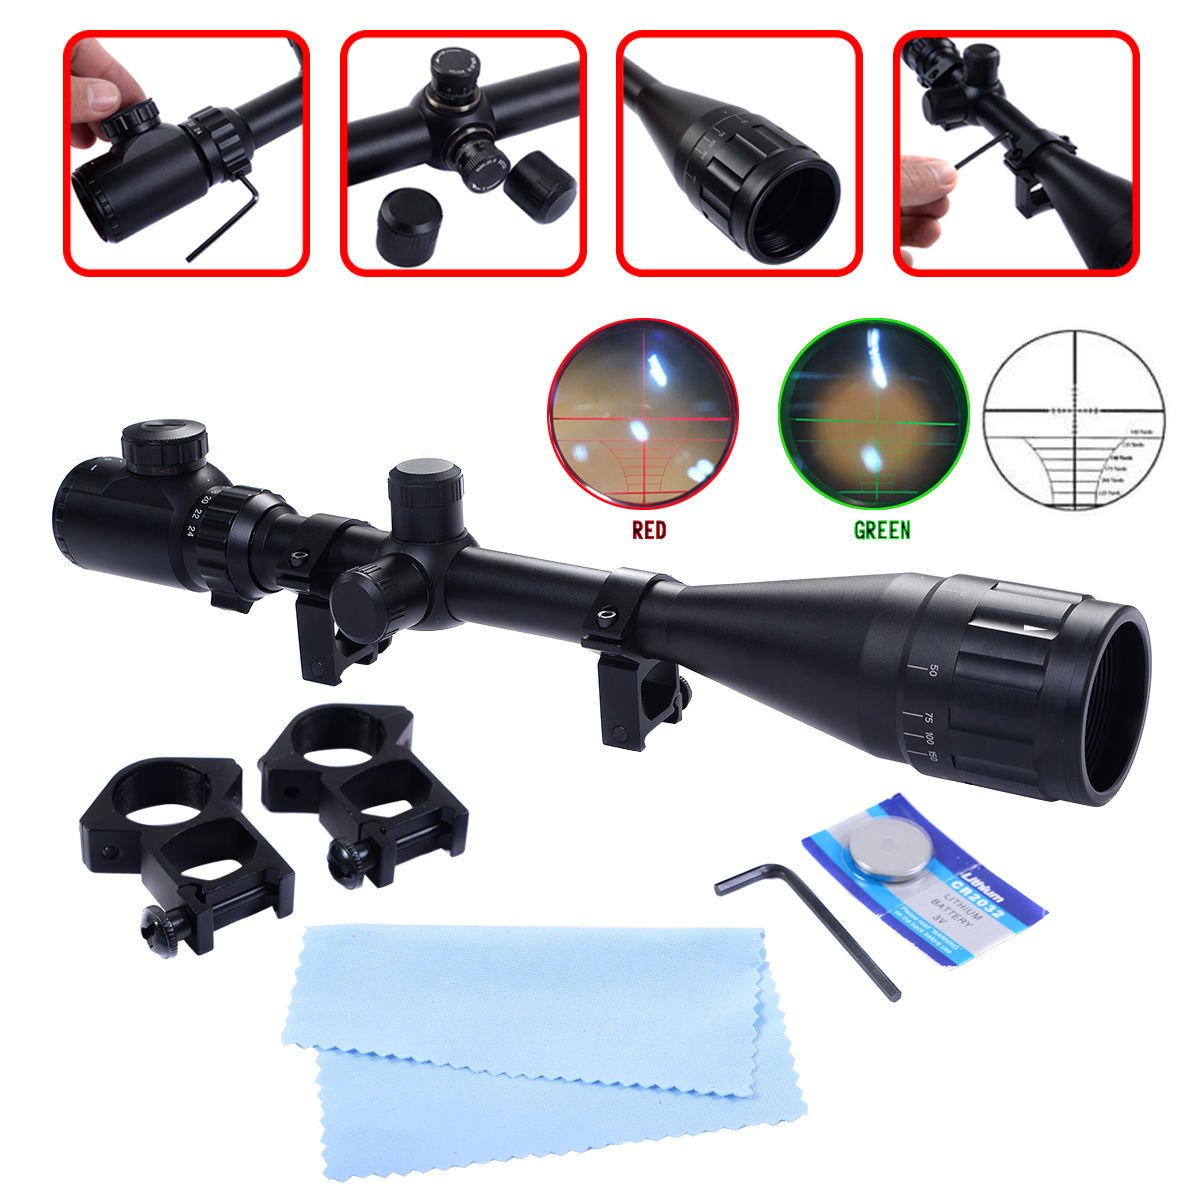 Safstar Reticle Riflescope Crosshair Optics Hunting Gun Scope with Free Mount